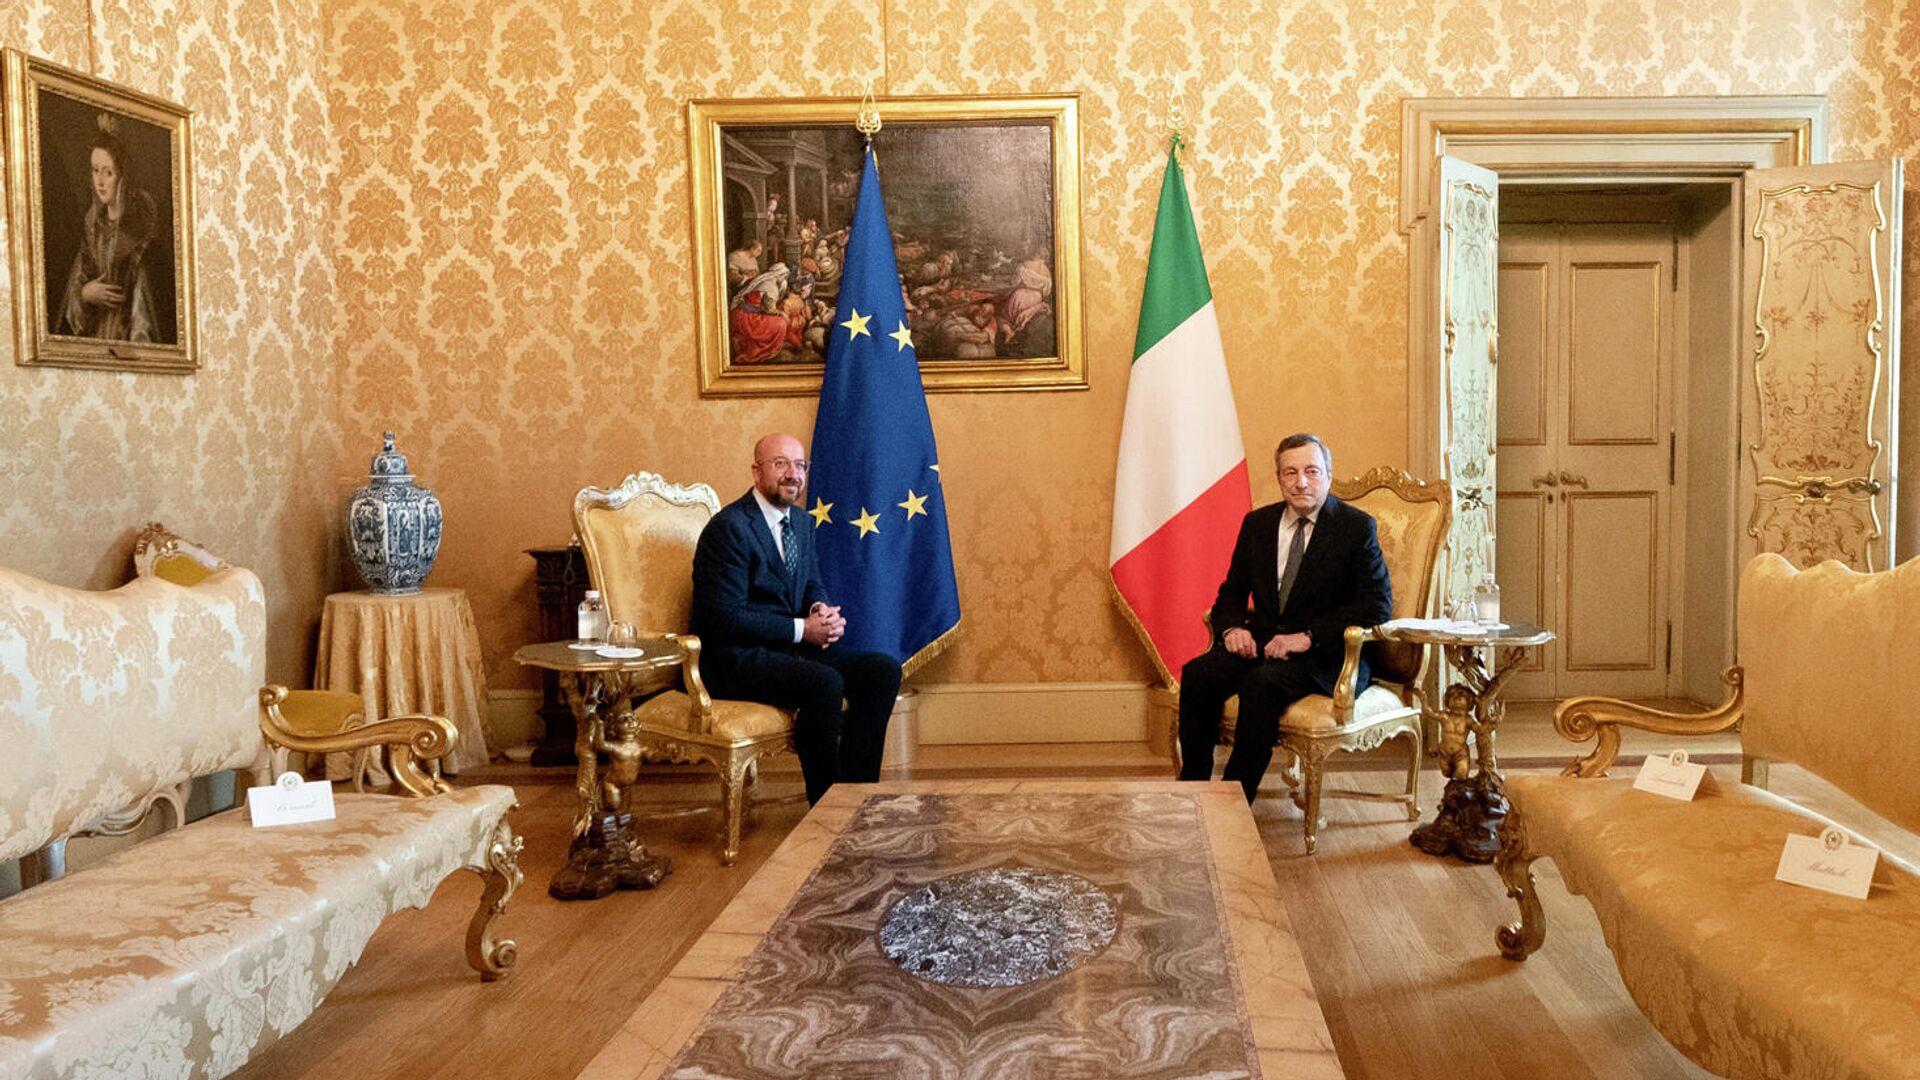 Draghi e Michel a Palazzo Chigi - Sputnik Italia, 1920, 09.09.2021